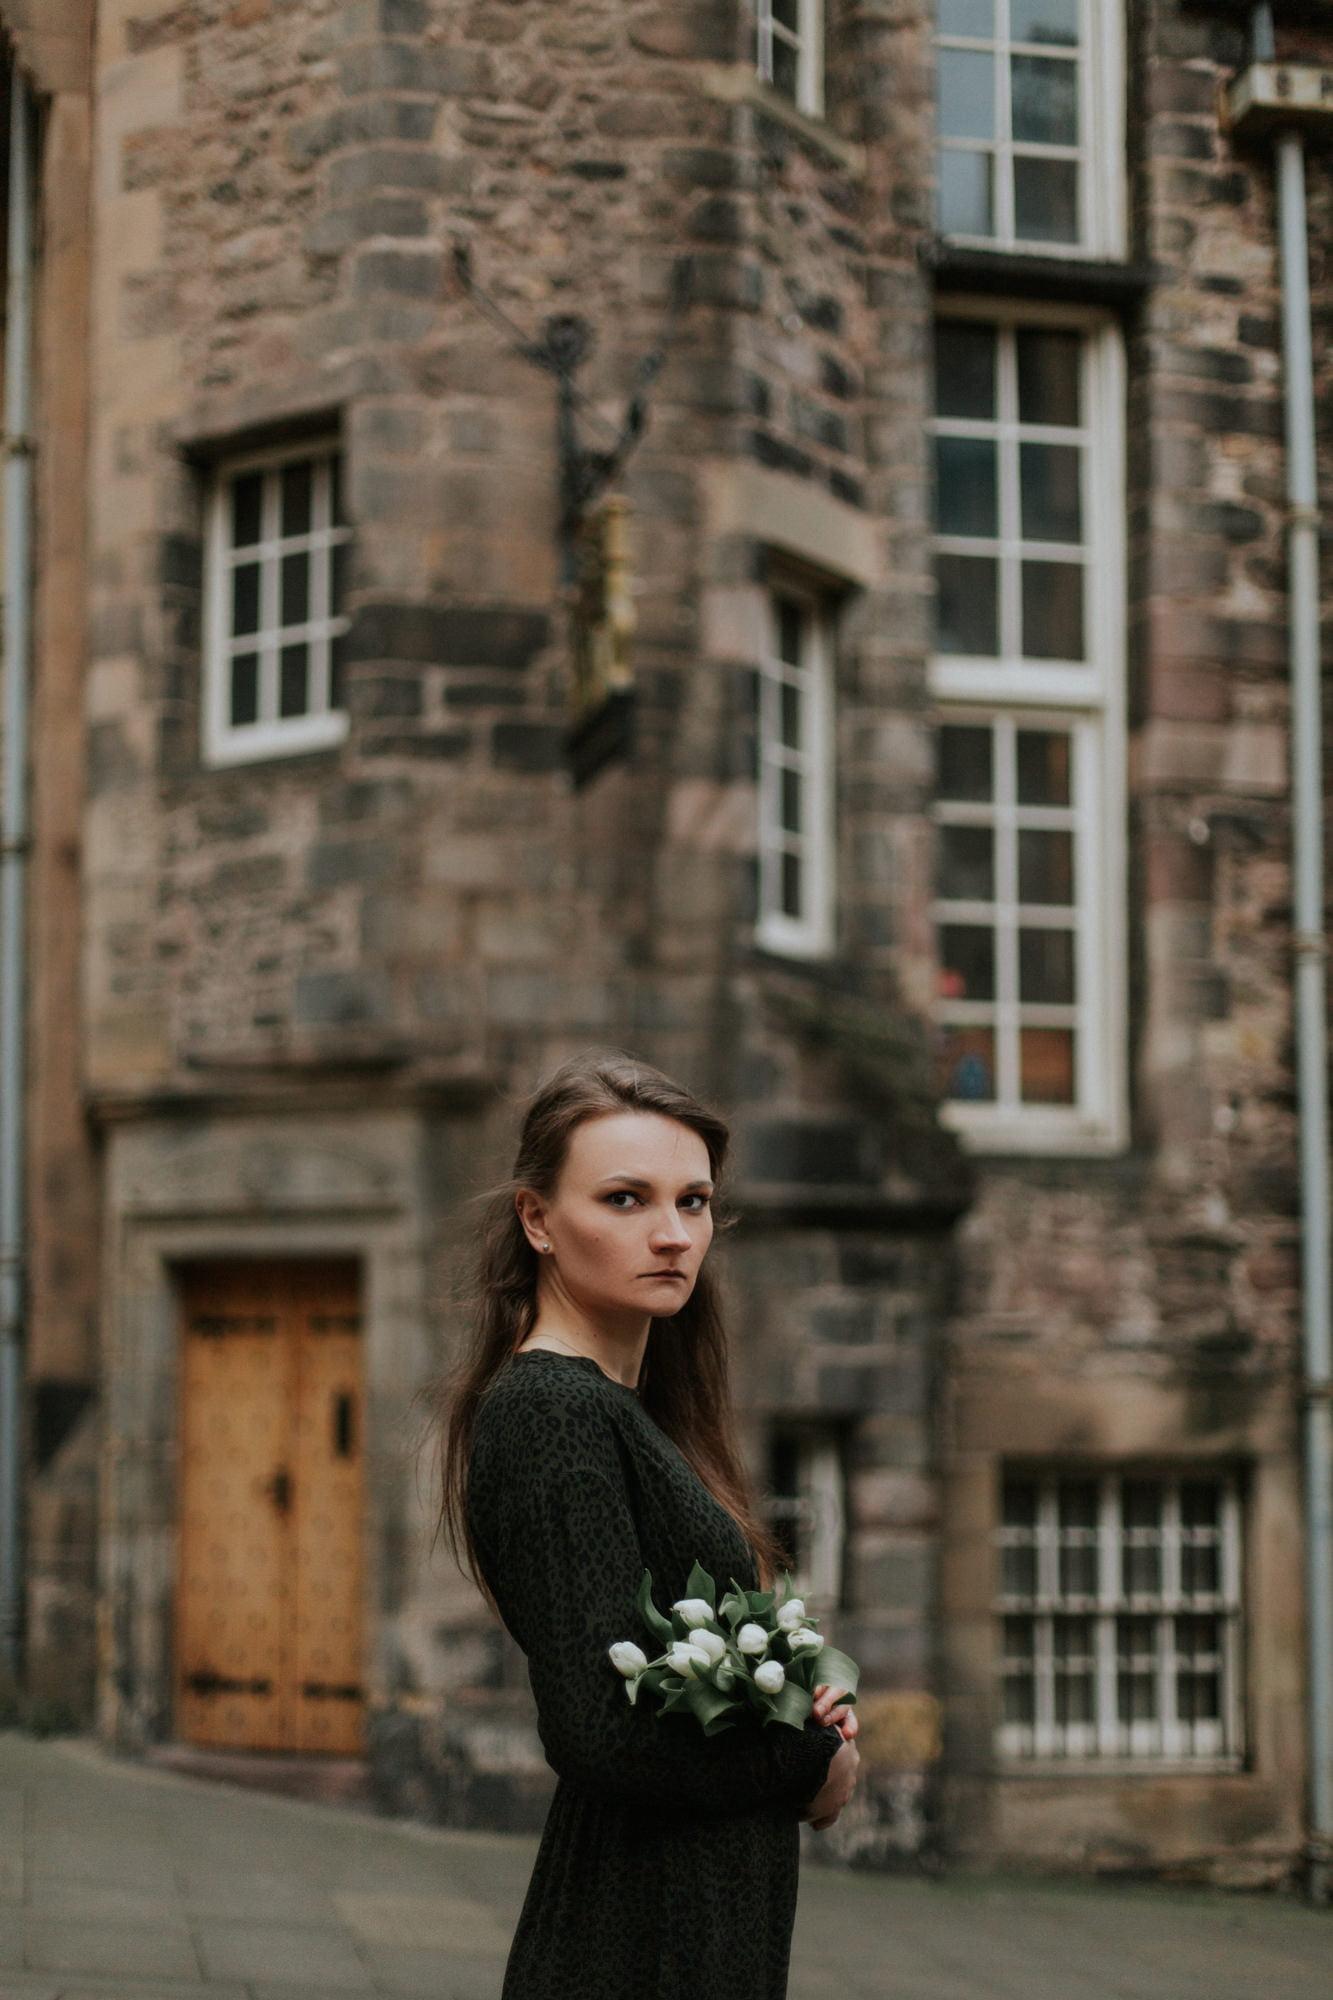 Edinburgh Photographer, Edinburgh Portrait Photoshoot in Old Town